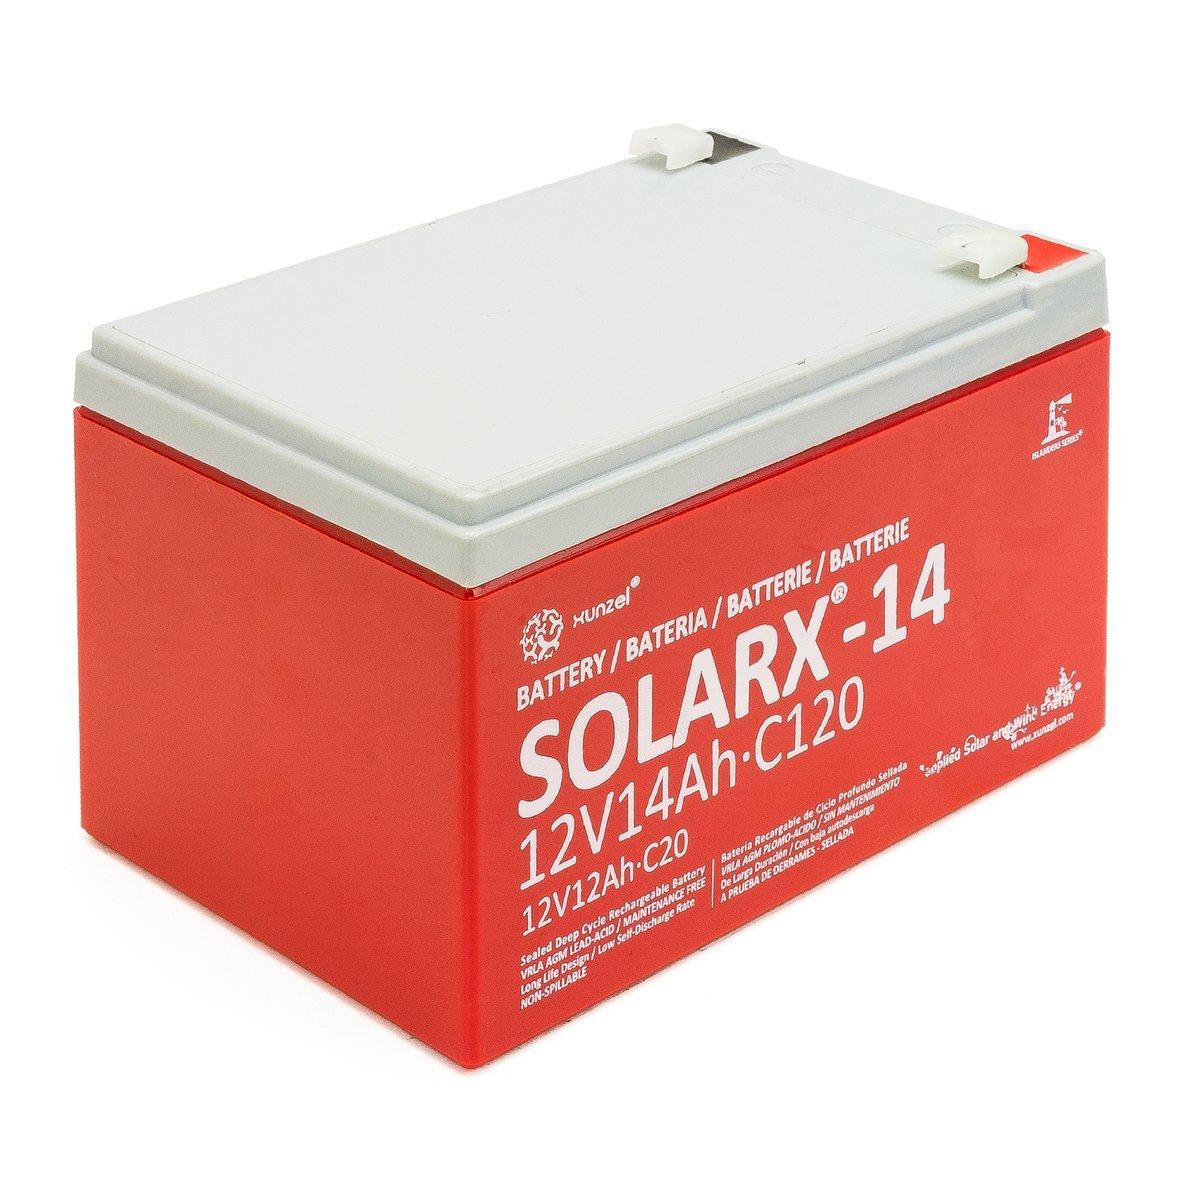 Xunzel Deep Cycle baterí a solar 12 V, 1 pieza, solarx de 14 1pieza SOLARX-14